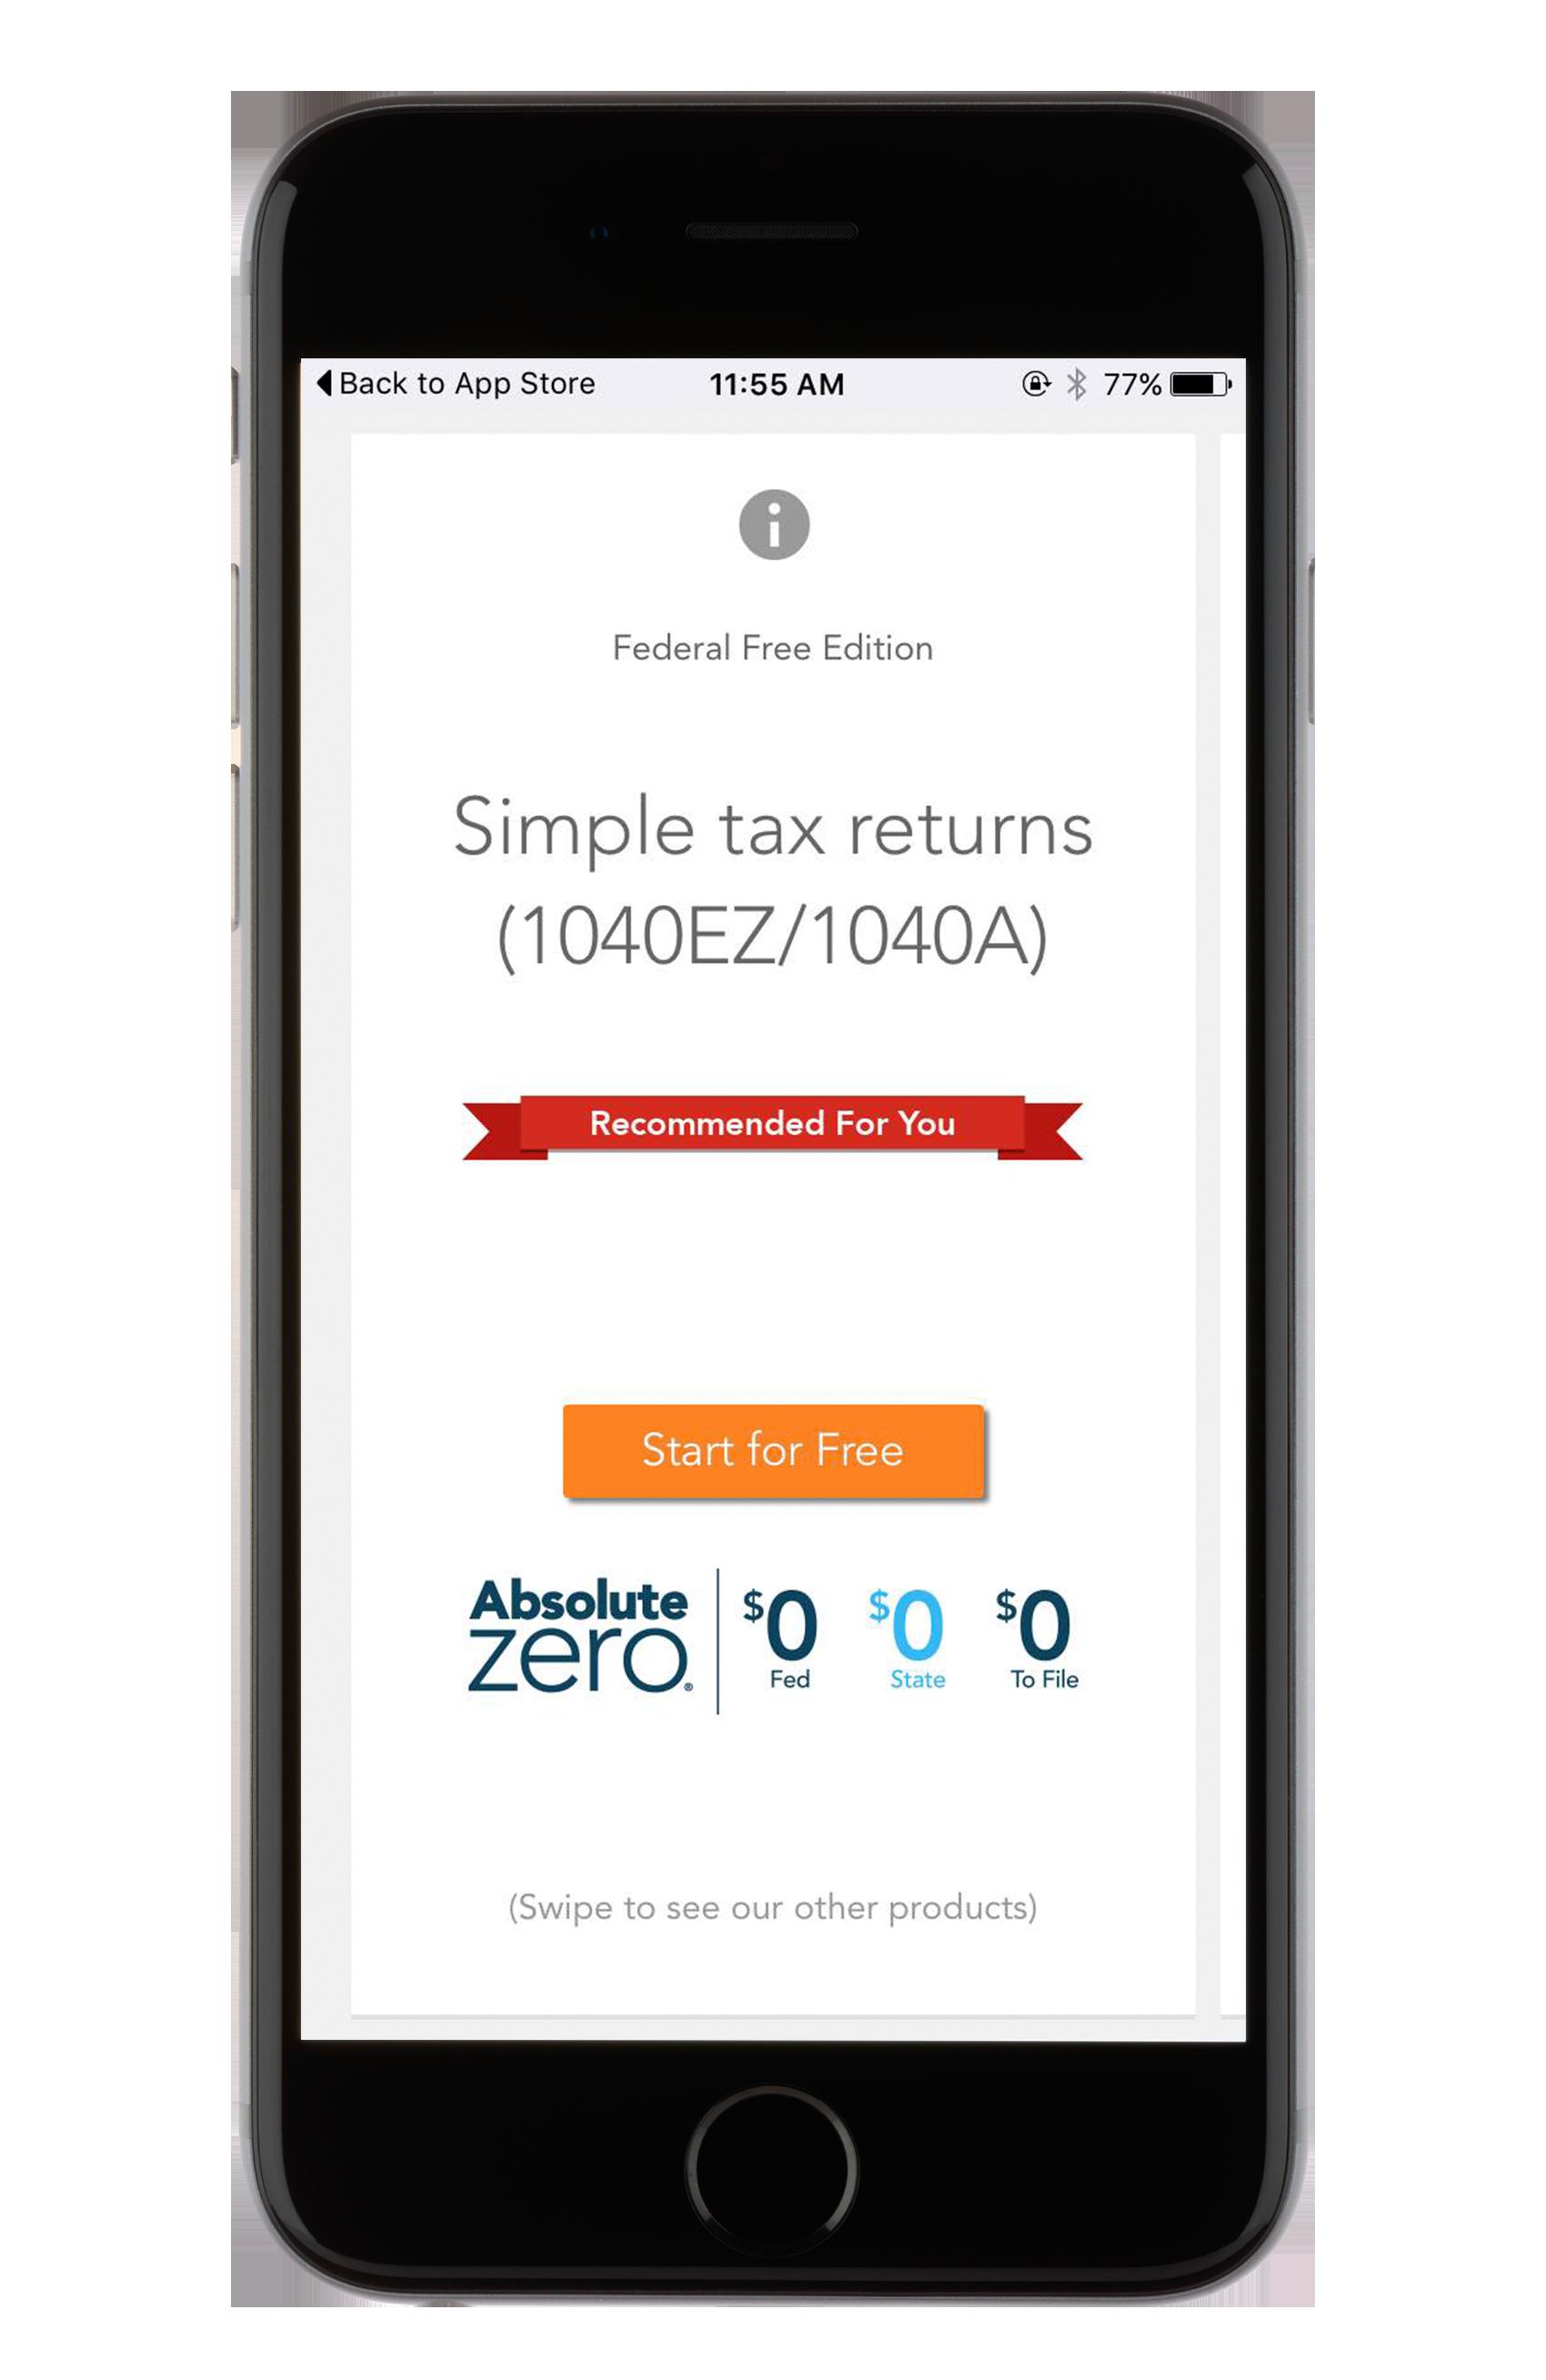 Turbotax Tax Preparation Mobile App Review Gobankingrates